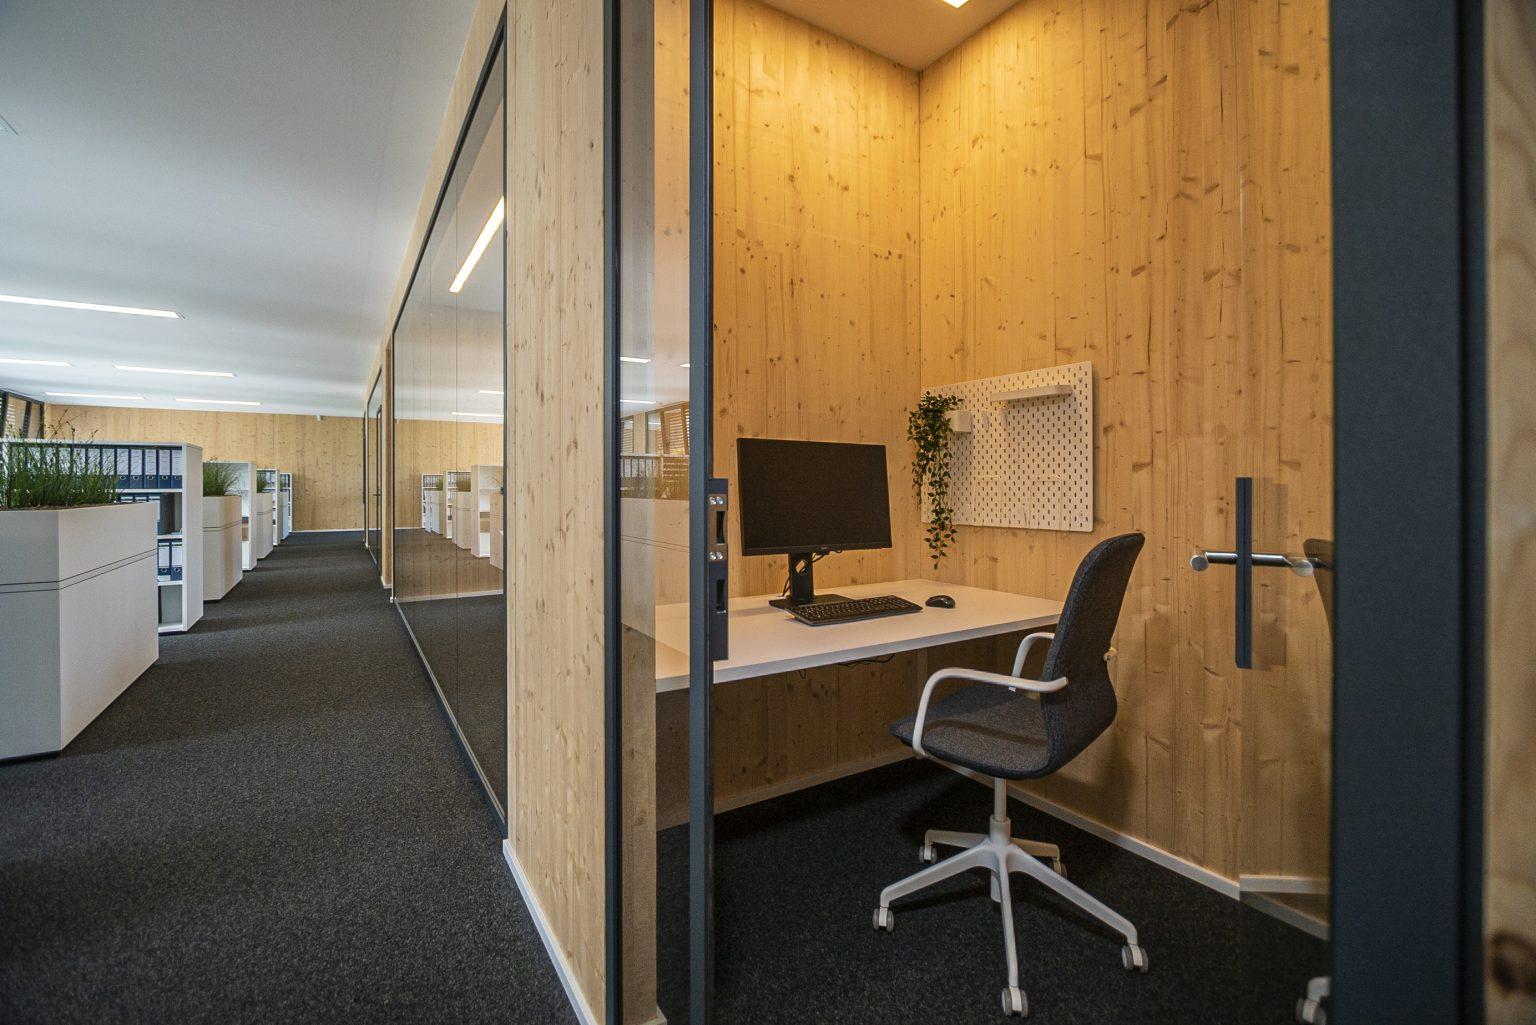 Bürogebäude_Zick-Hessler_Holzbauweise (34)